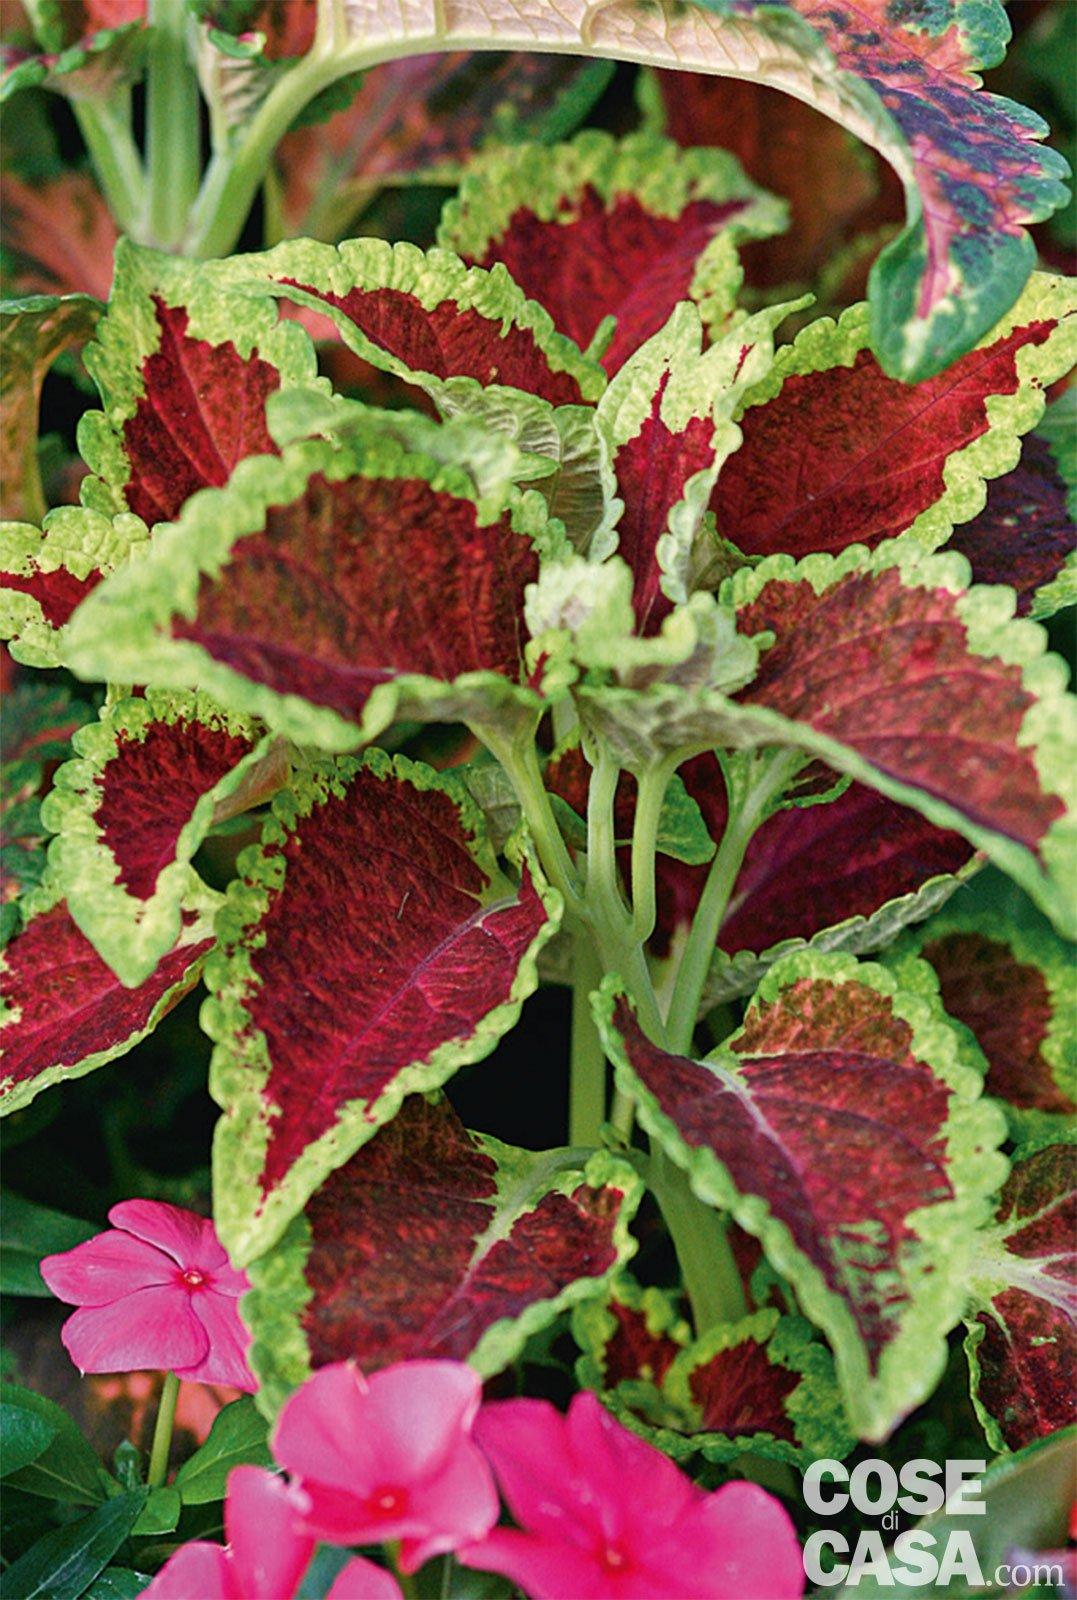 Pianta Foglie Rosse E Verdi coleus blumei - coleus: cure pianta, riproduzione - cose di casa